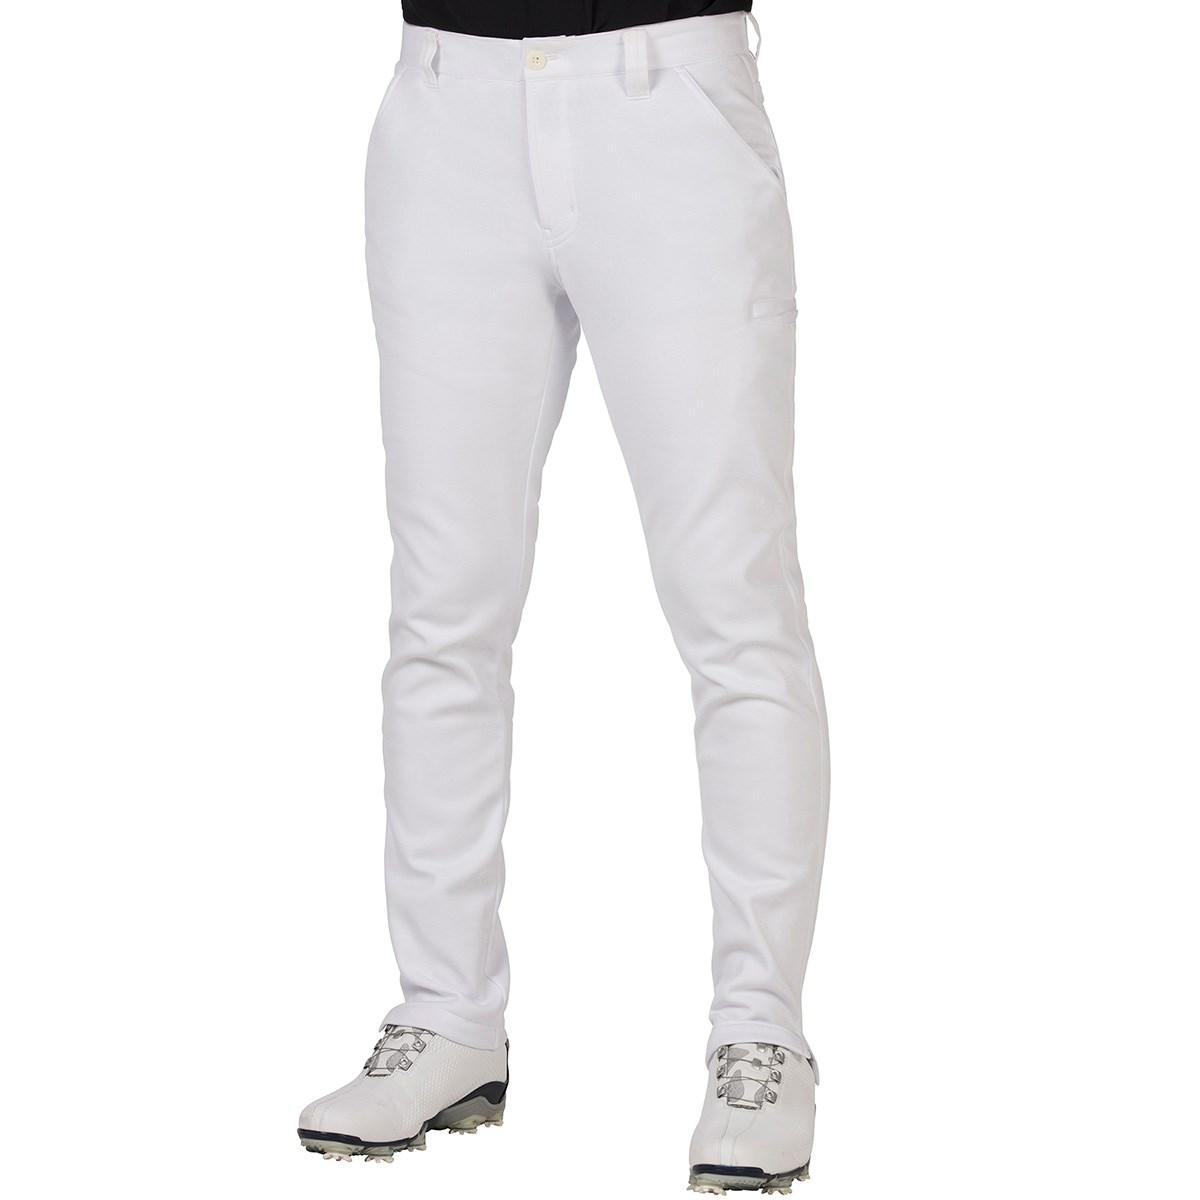 GDO オリジナル GDO ORIGINAL 7ポケットボンディングパンツ 股下73cm 00:ウエスト目安69-71 ホワイト